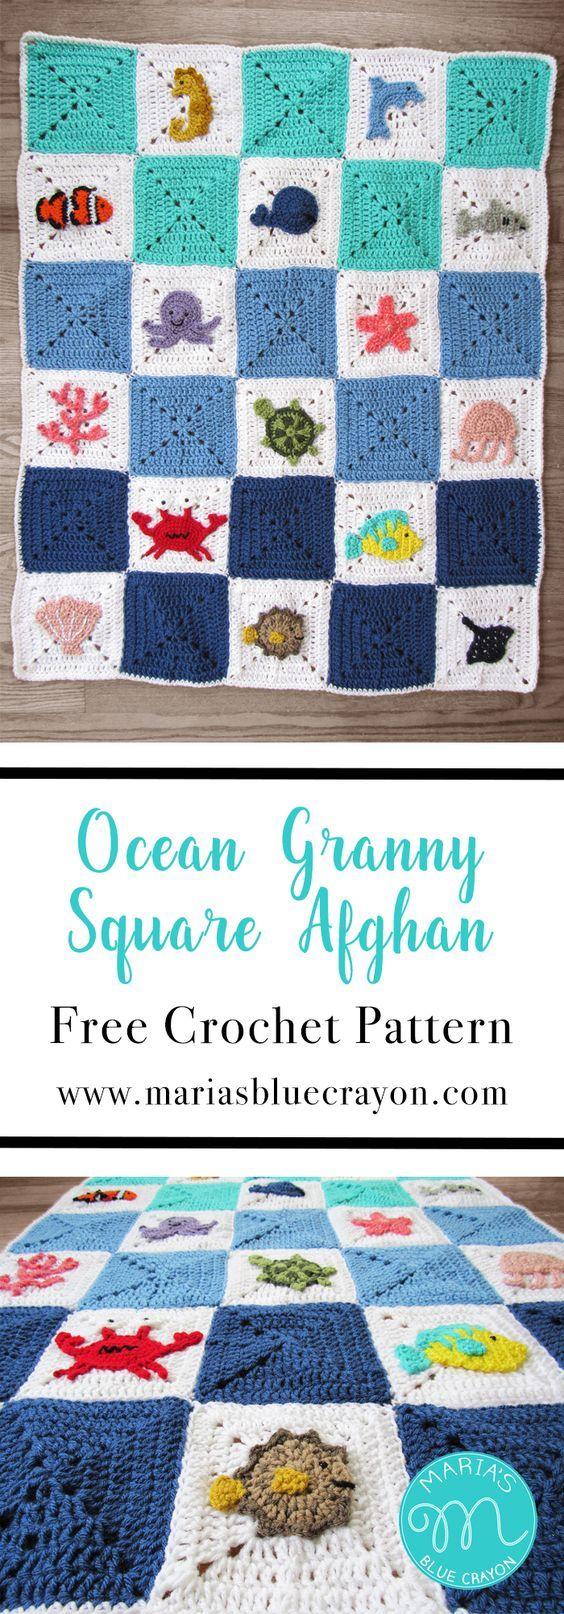 Ocean Granny Square Afghan Free Crochet Pattern. | Crochet throws ...